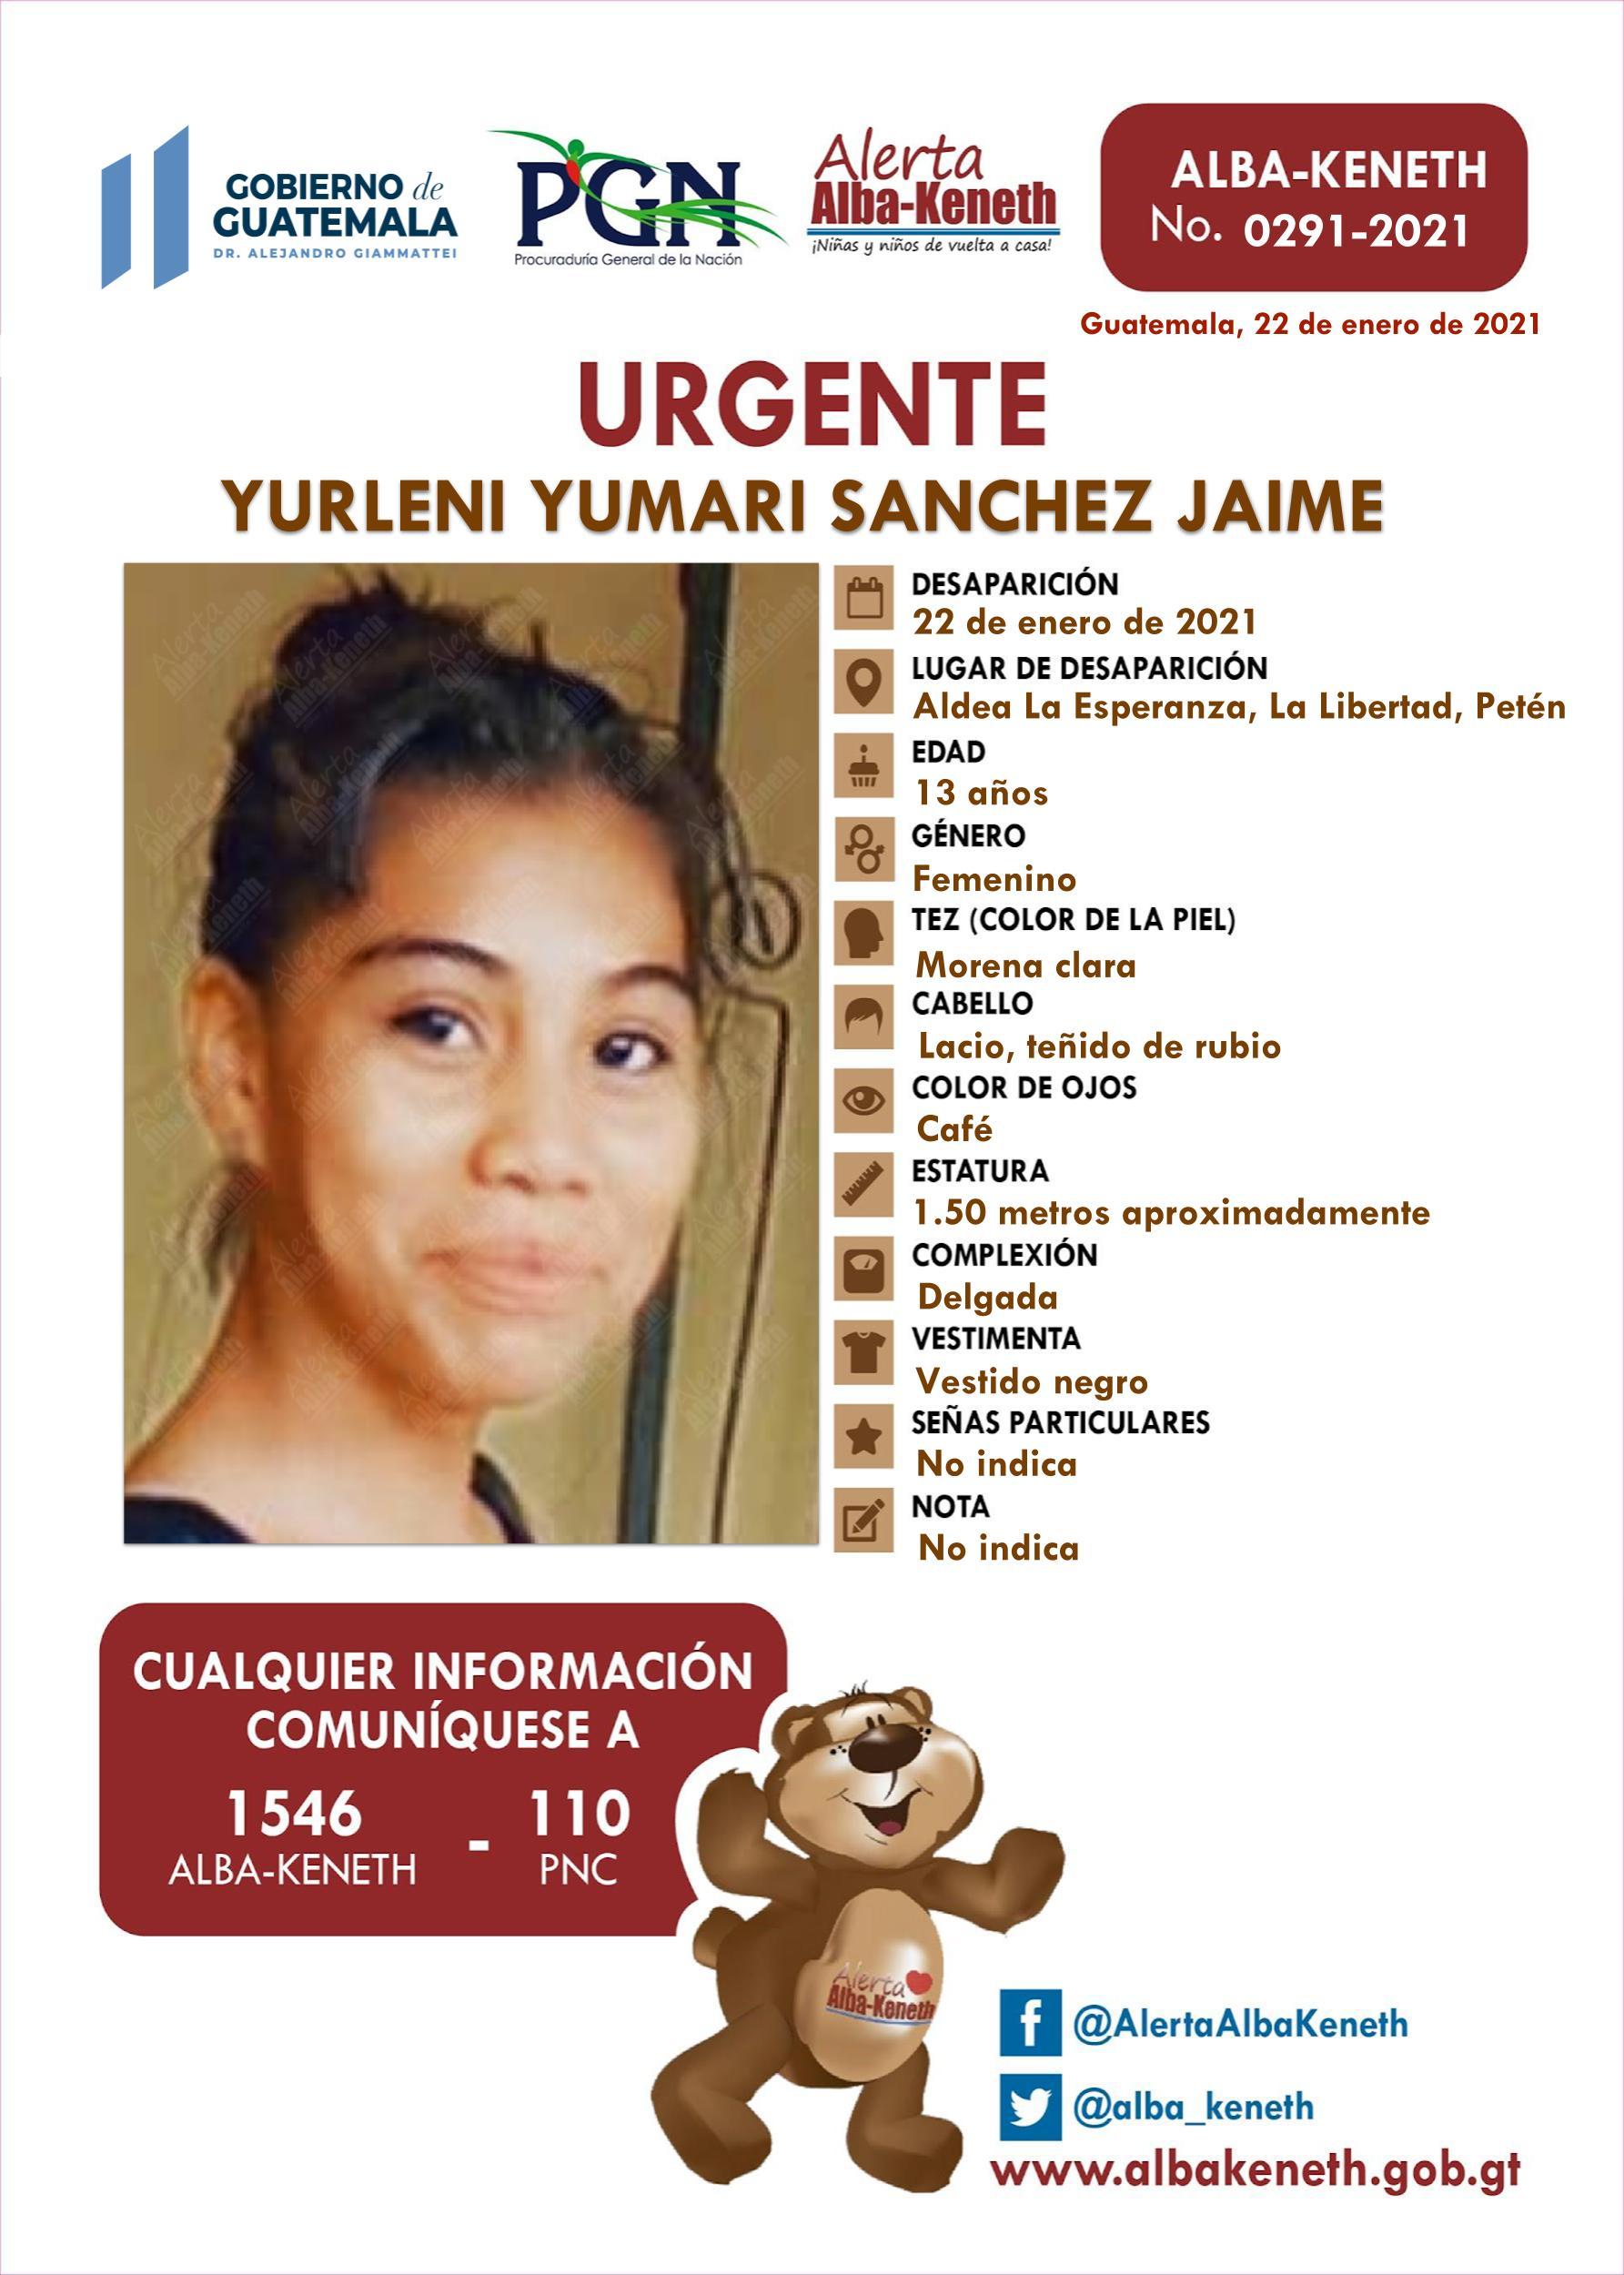 Yurleni Yumari Sanchez Jaime